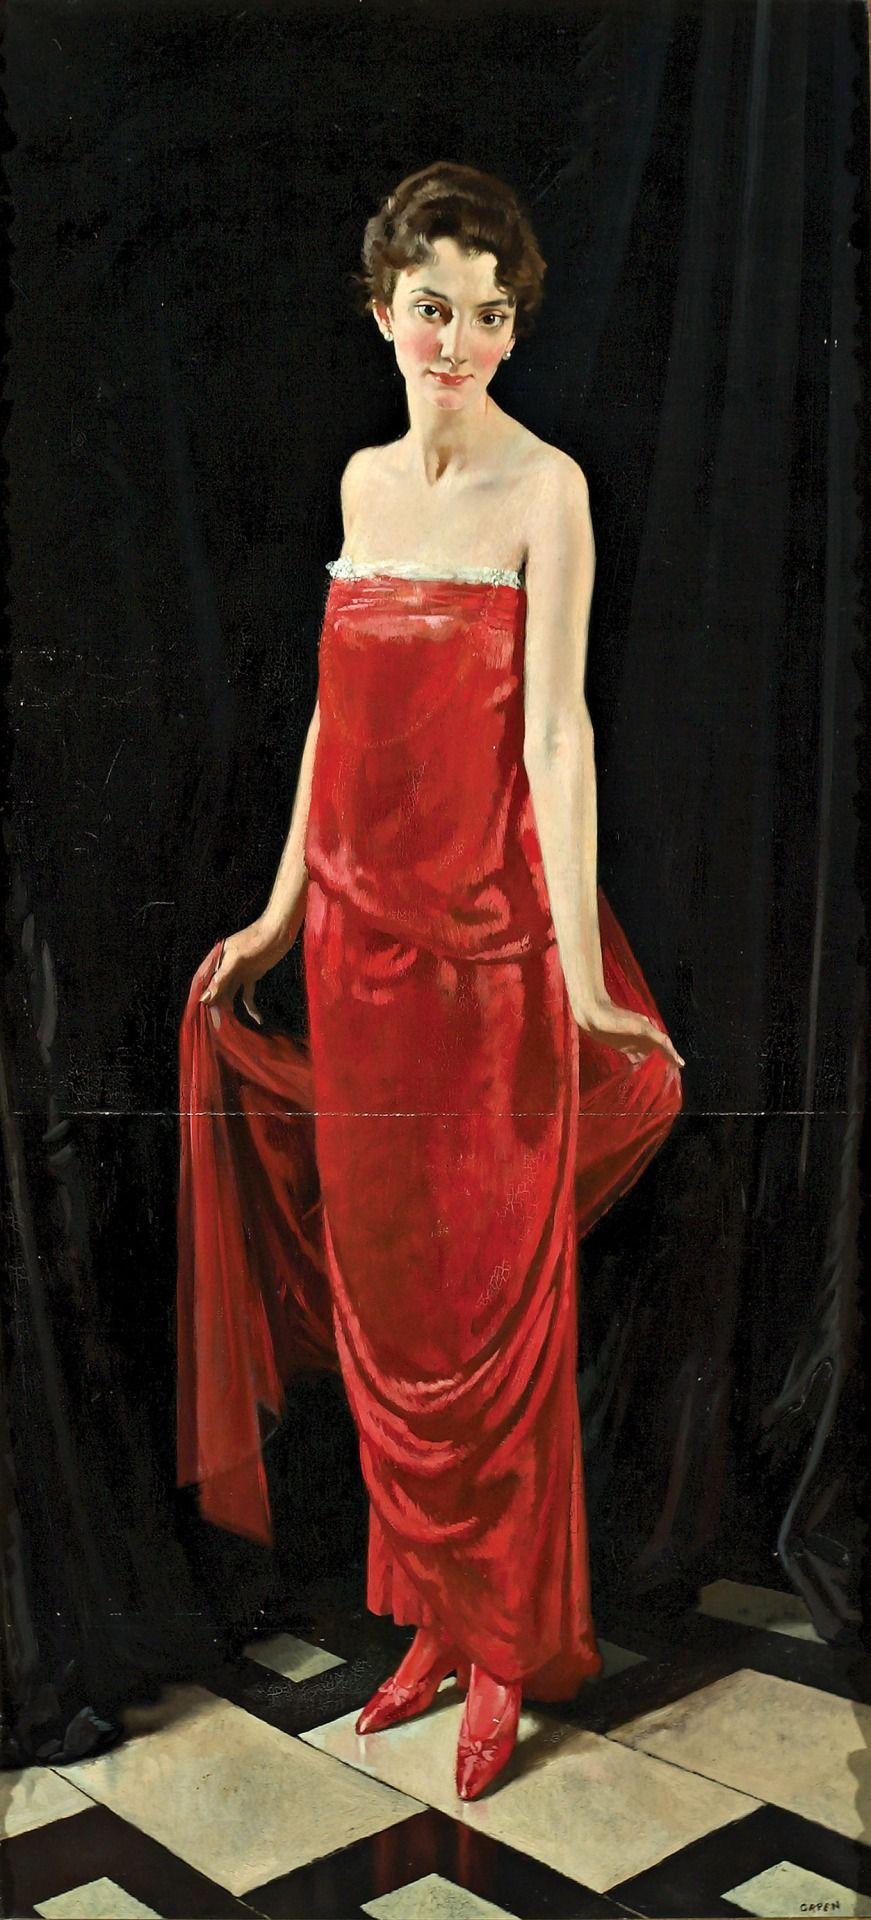 Madame Errazuriz, 1915 Sir William Orpen (1878-1931)